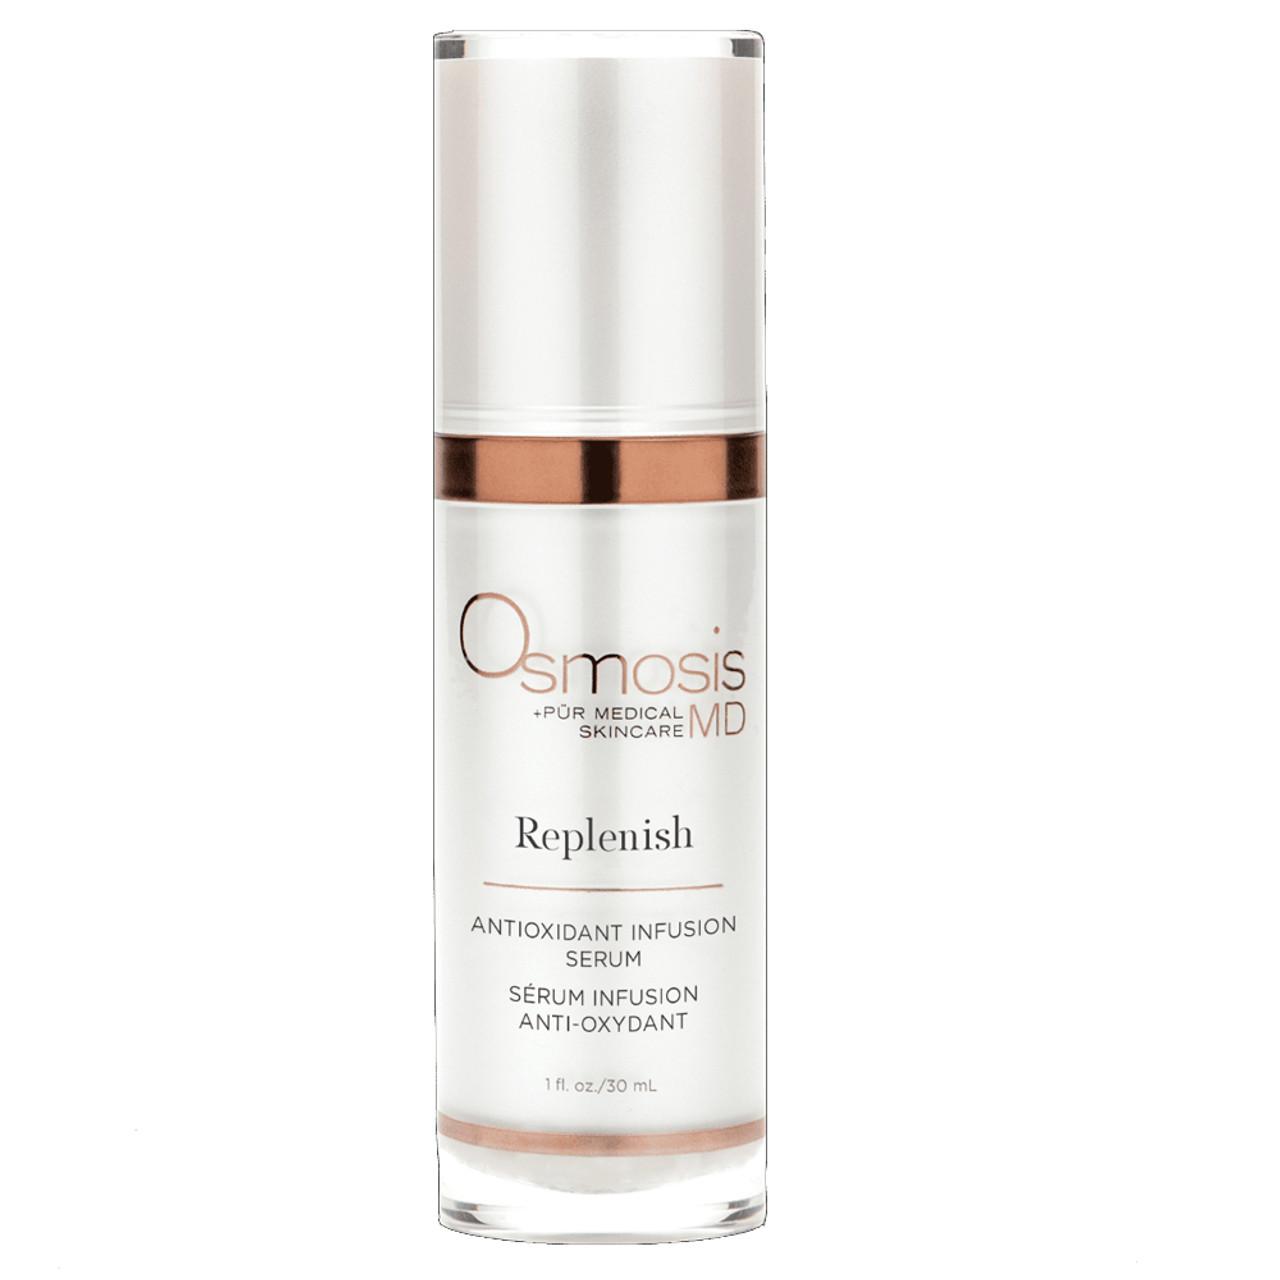 Osmosis +Skincare MD Replenish - Antioxidant Infusion Serum BeautifiedYou.com